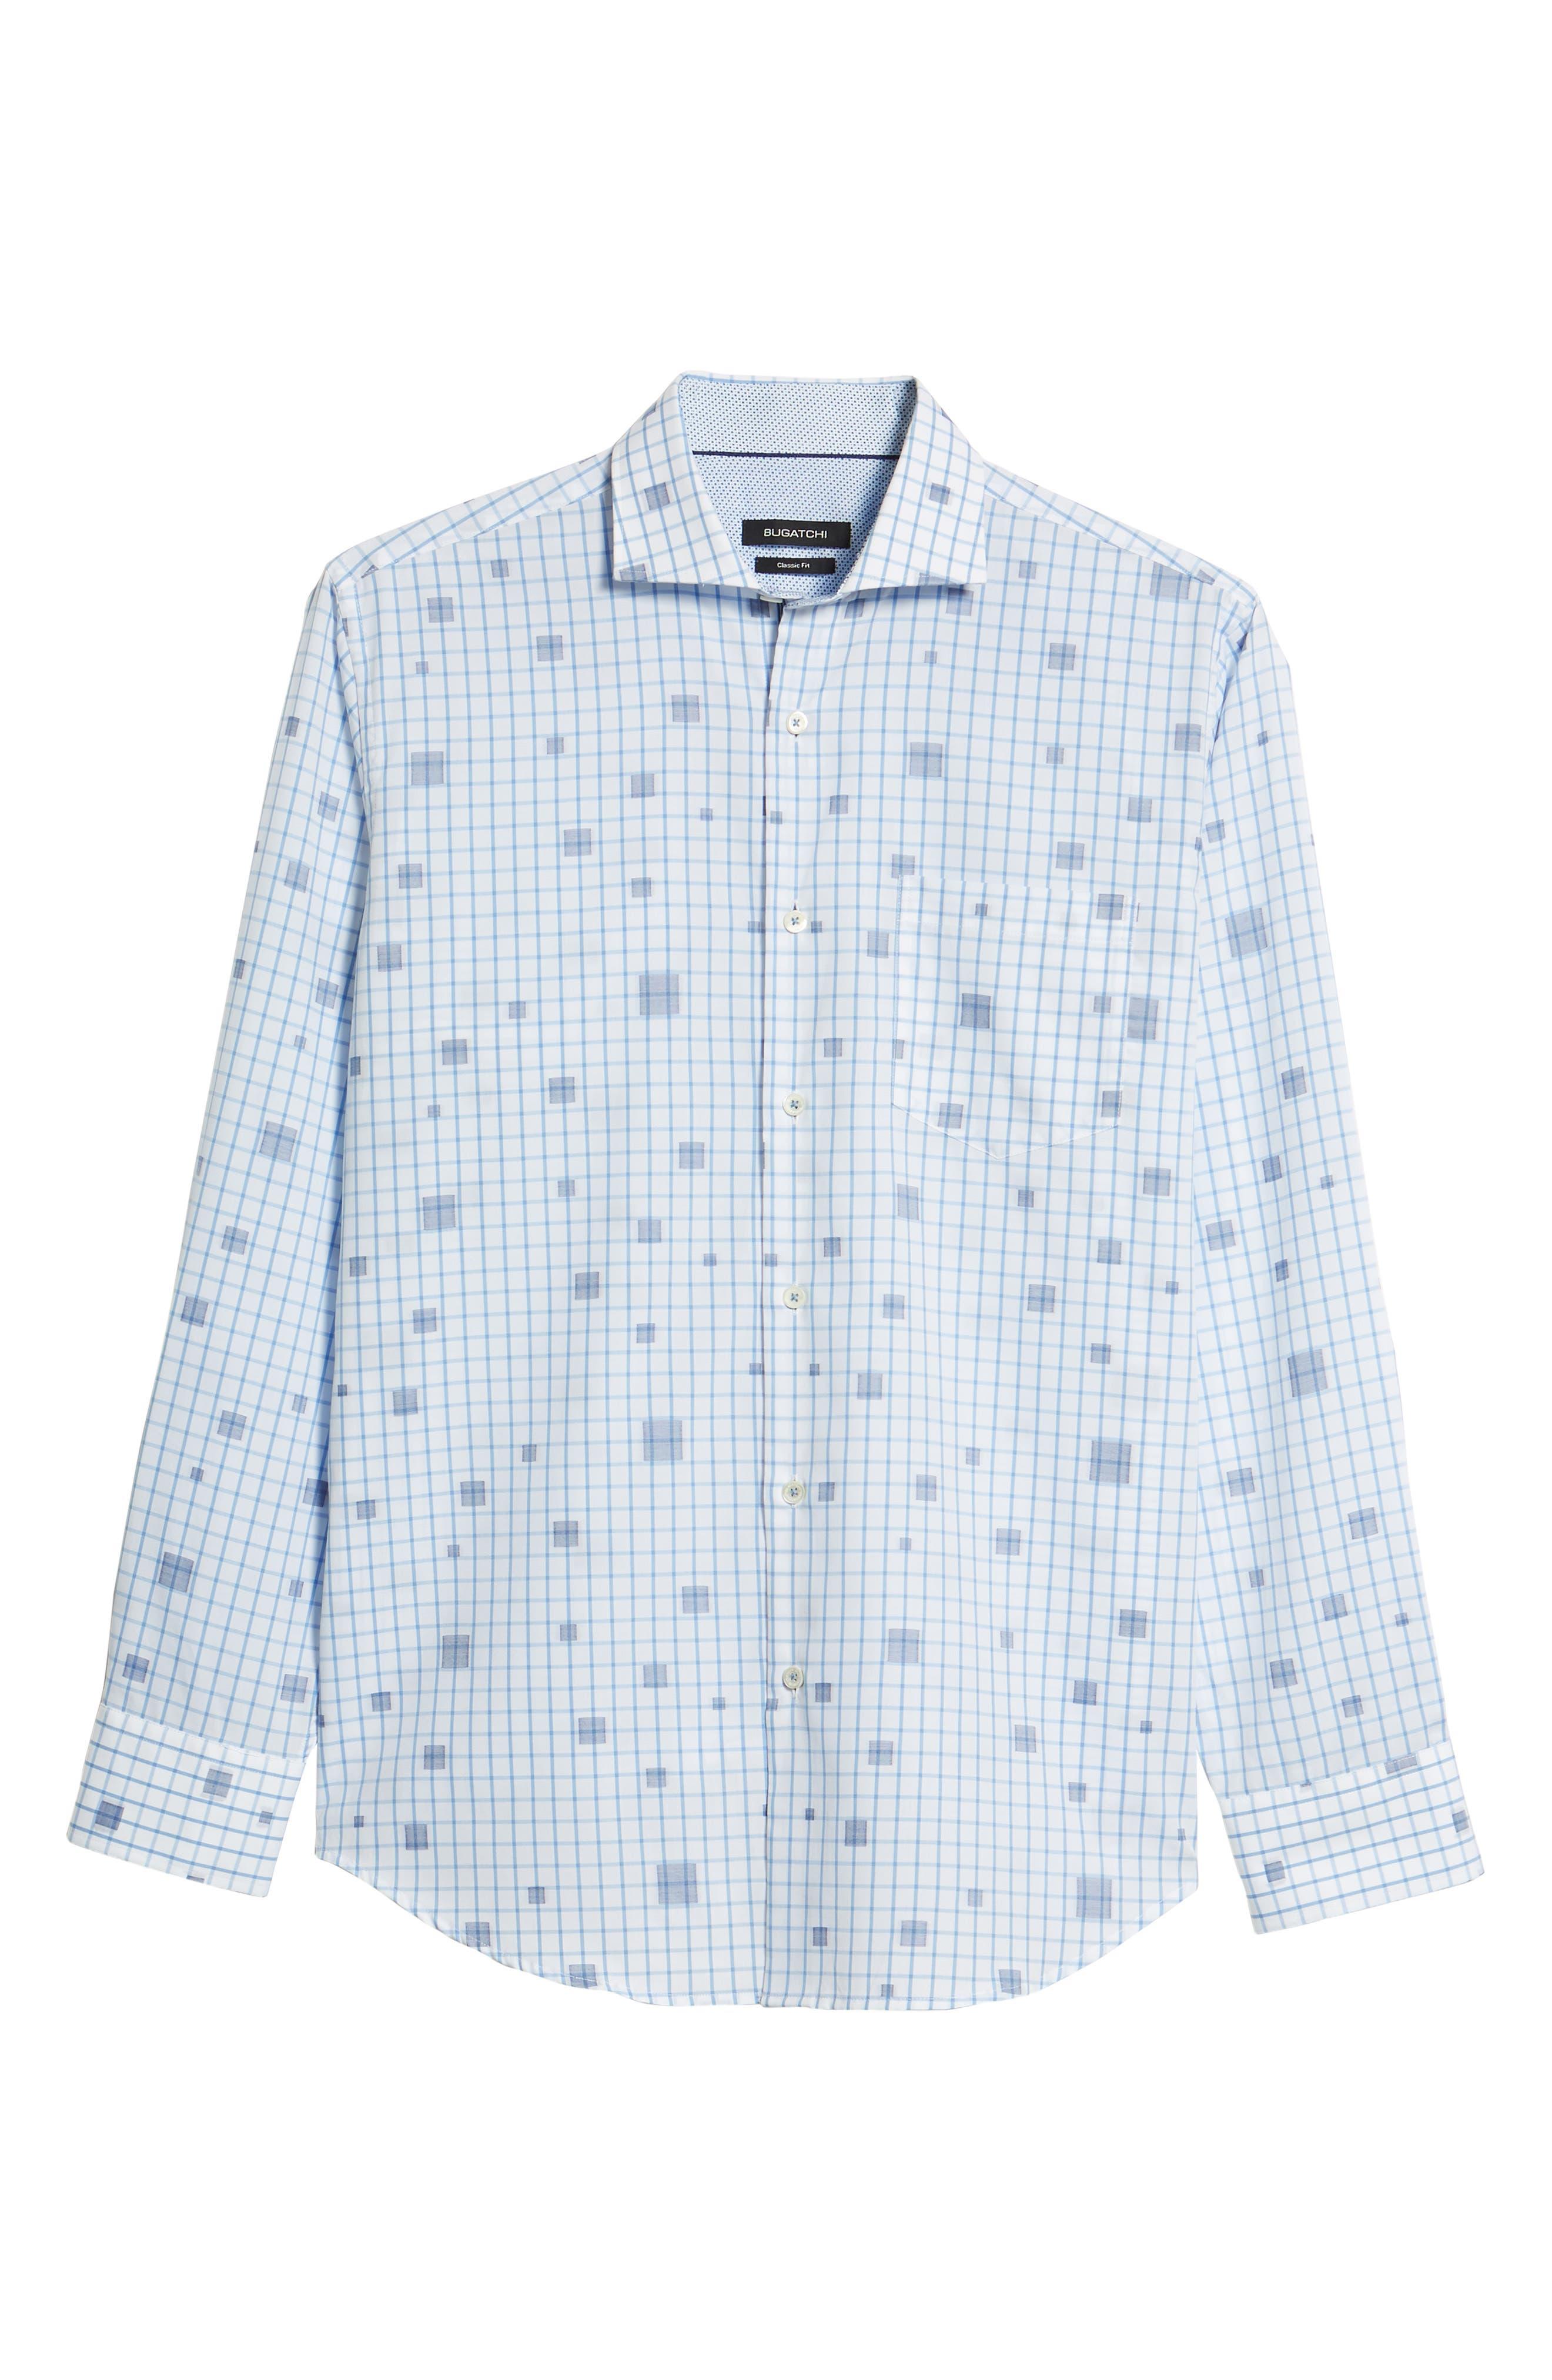 Classic Fit Square Check Sport Shirt,                             Alternate thumbnail 6, color,                             422